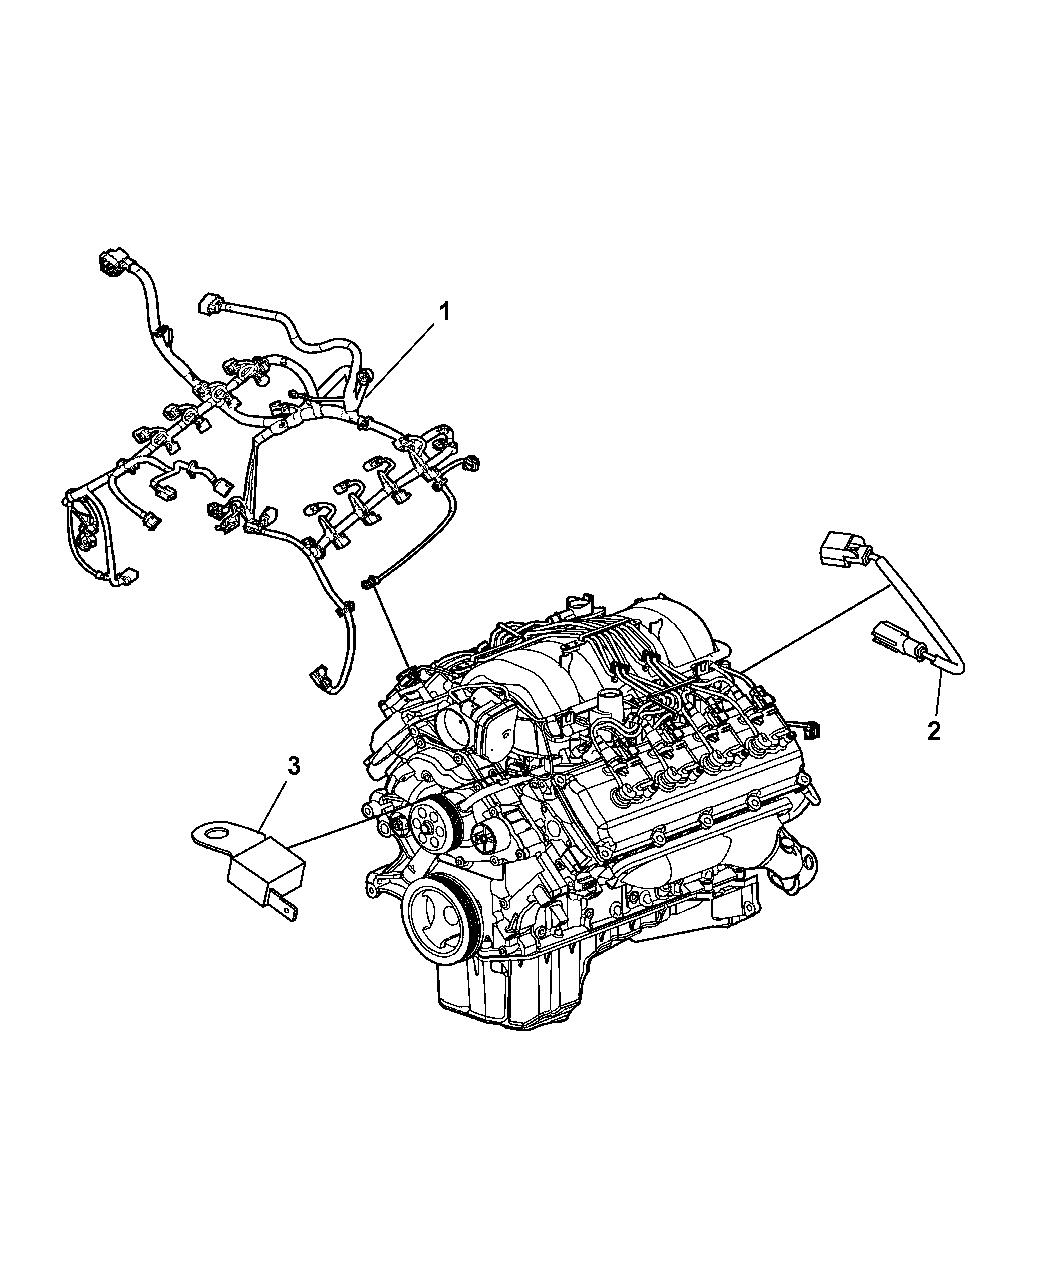 2011 Dodge Charger Wiring Engine Mopar Parts Giant Diagram Thumbnail 1